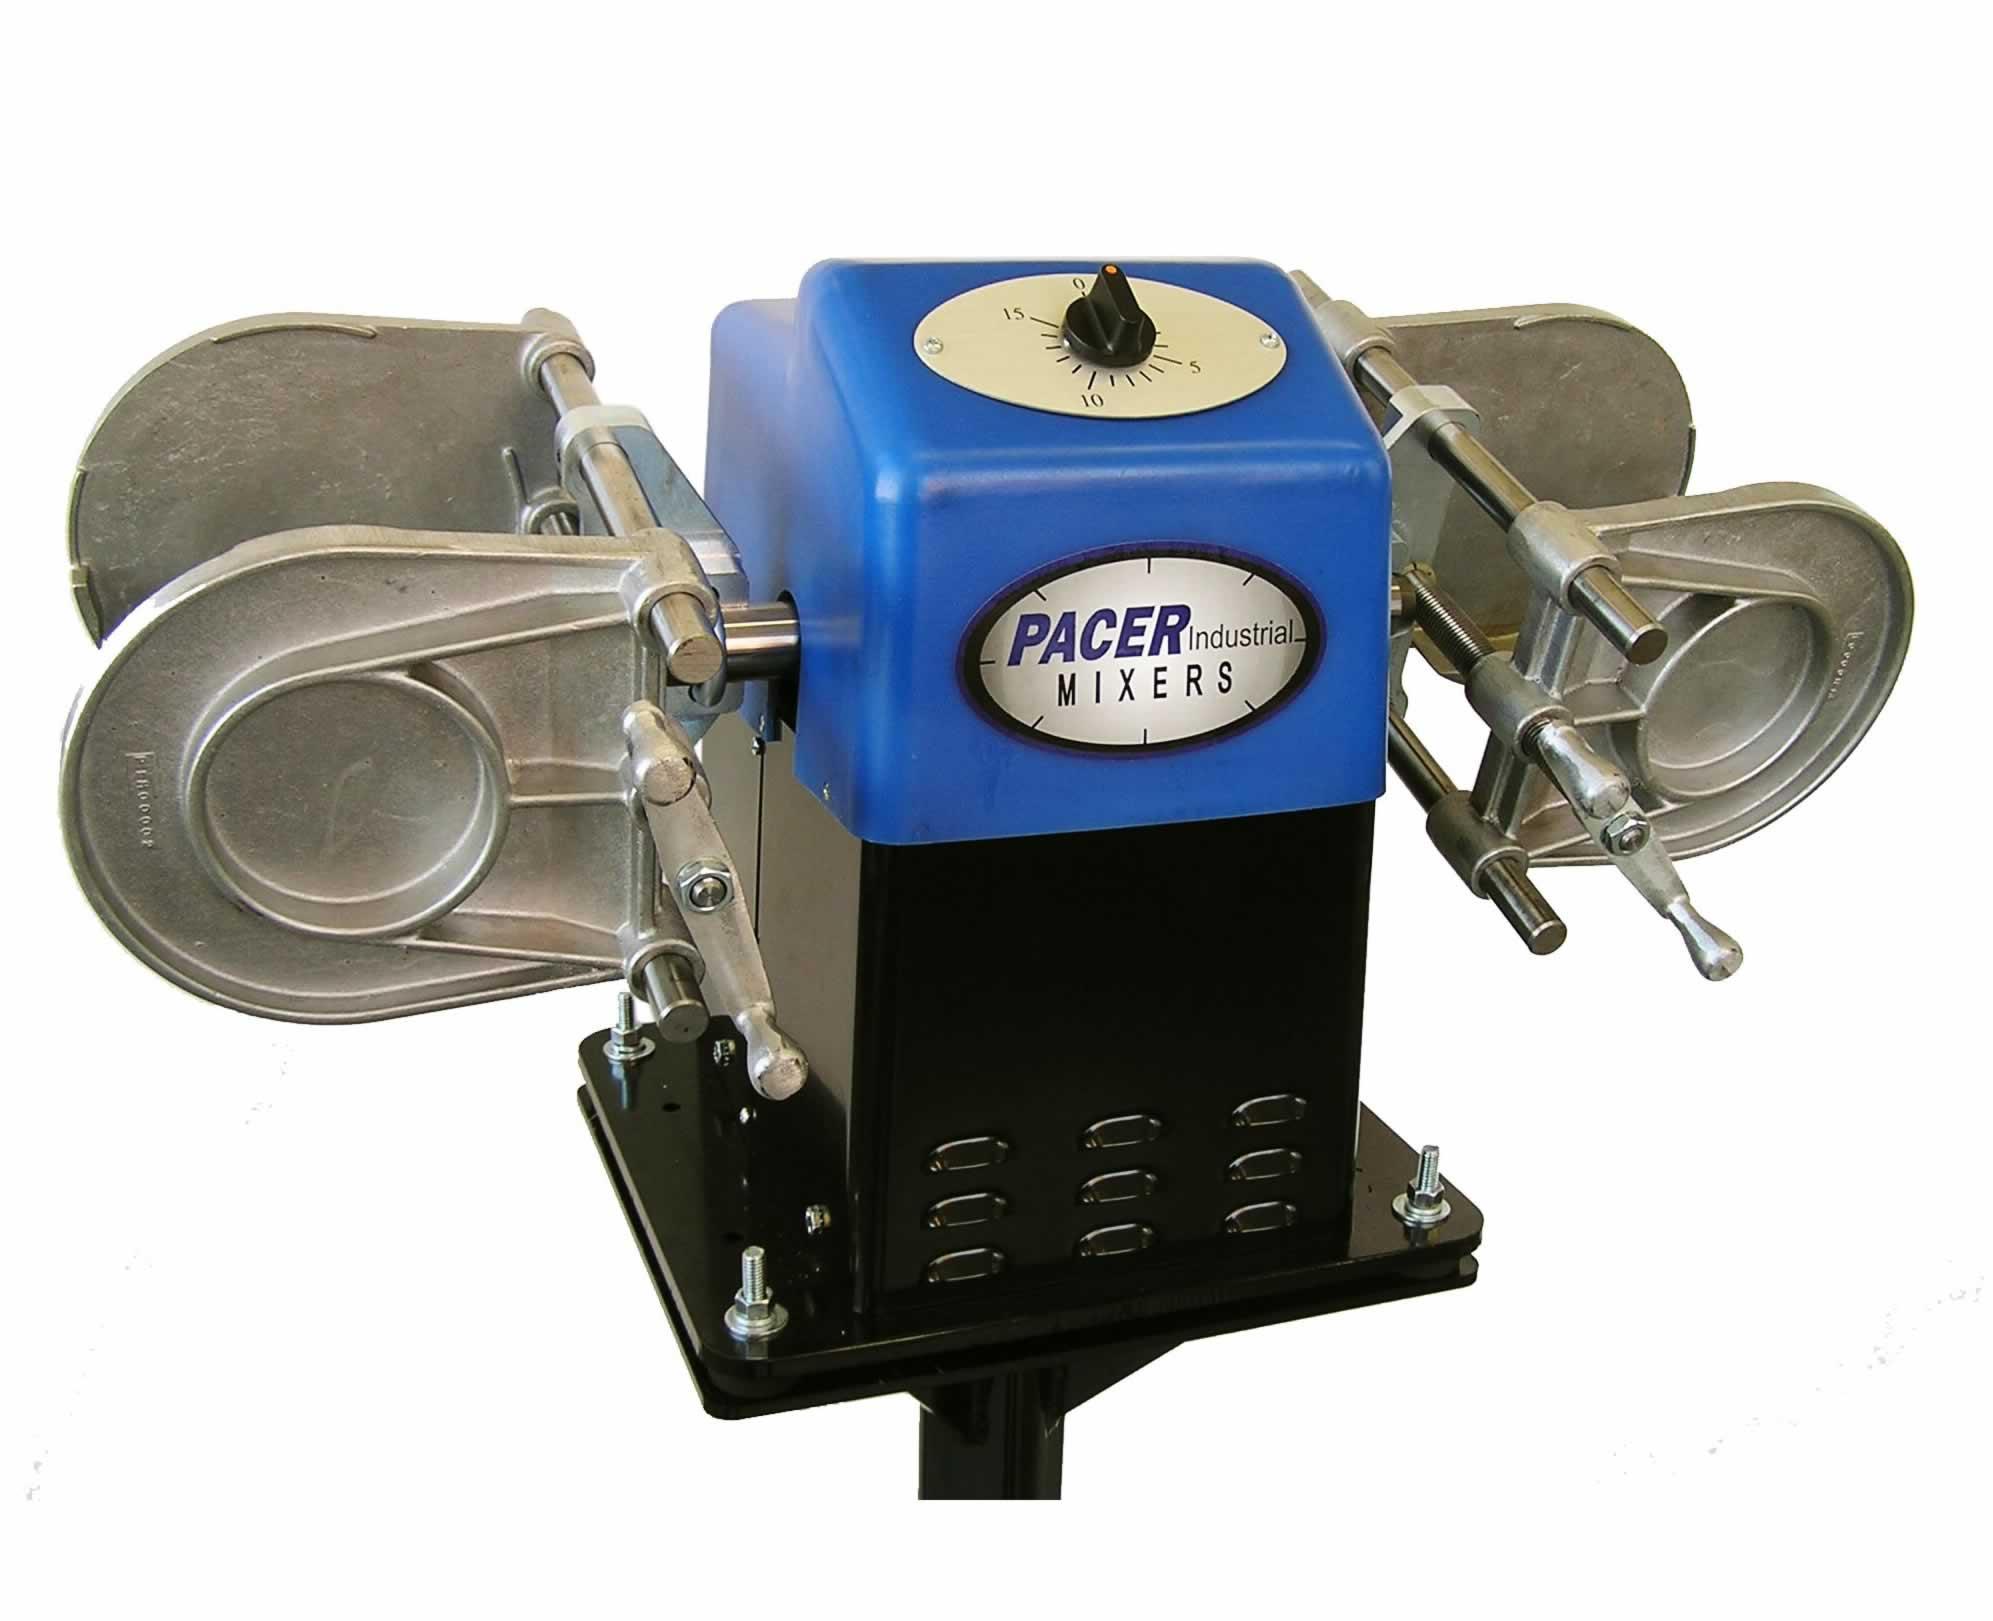 Pacer dual 15 industrial paint mixer paint shaker for 5 gallon paint mixer